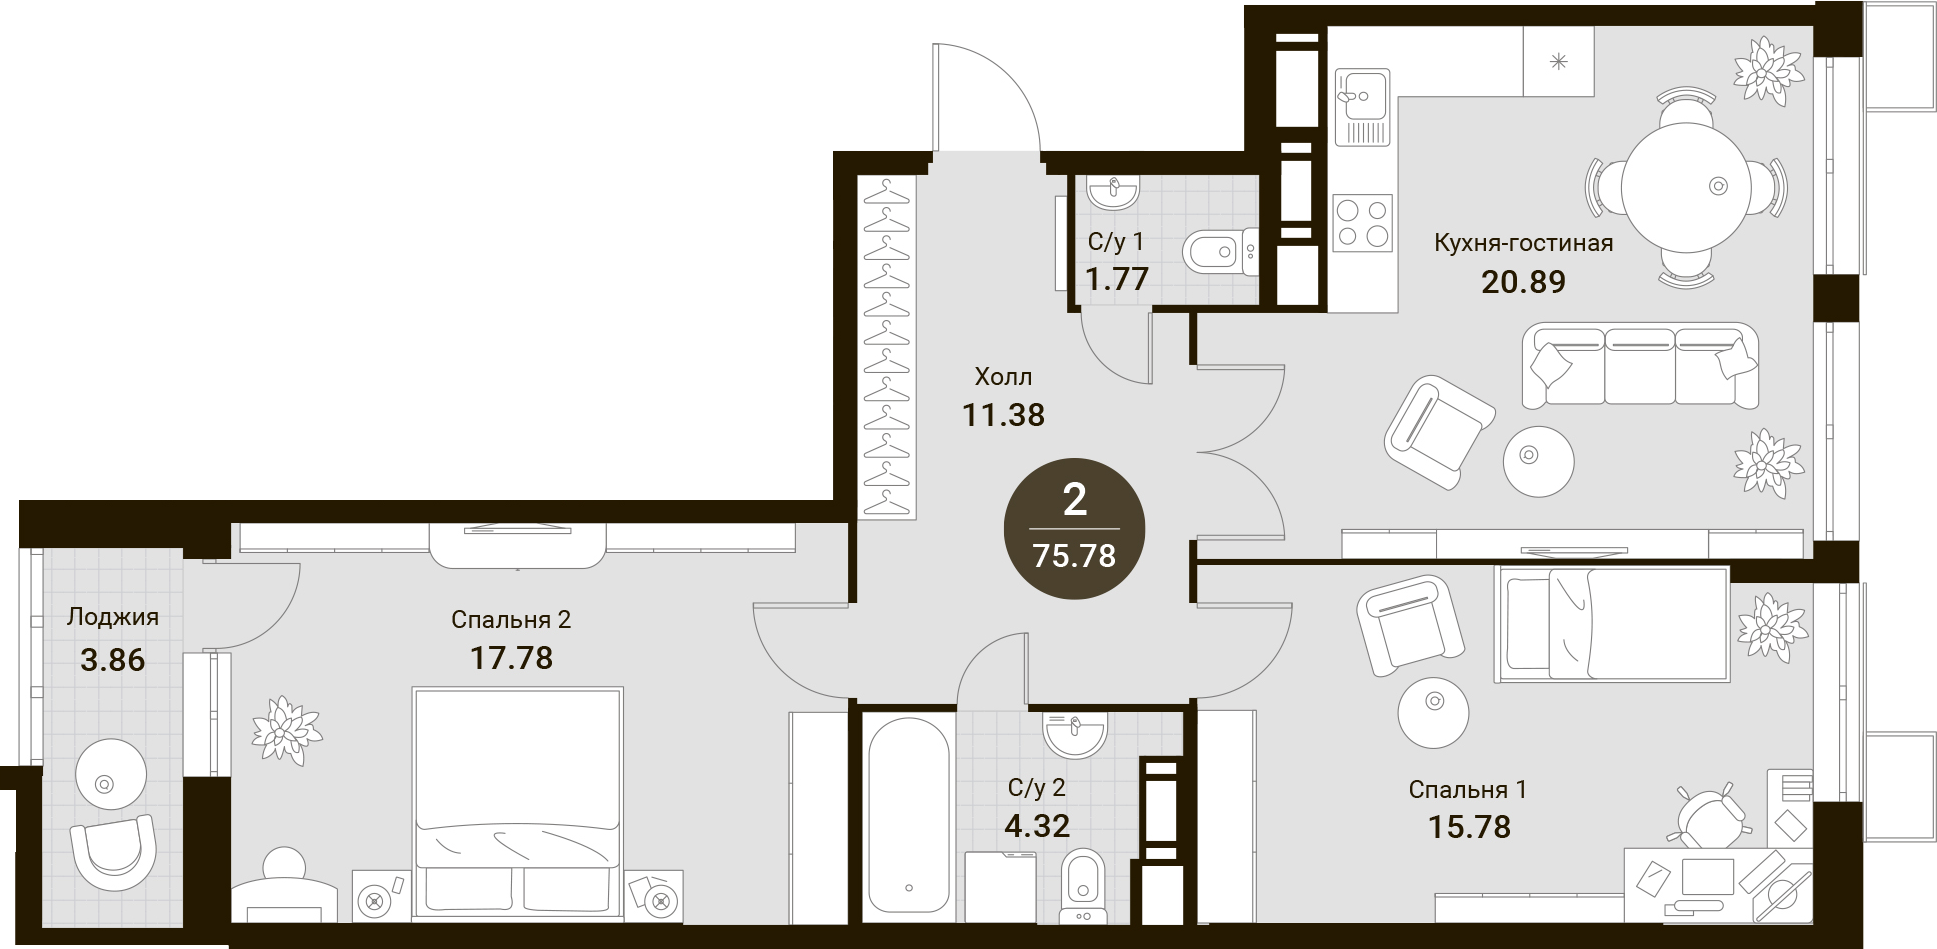 3Е-к.кв, 75.78 м²